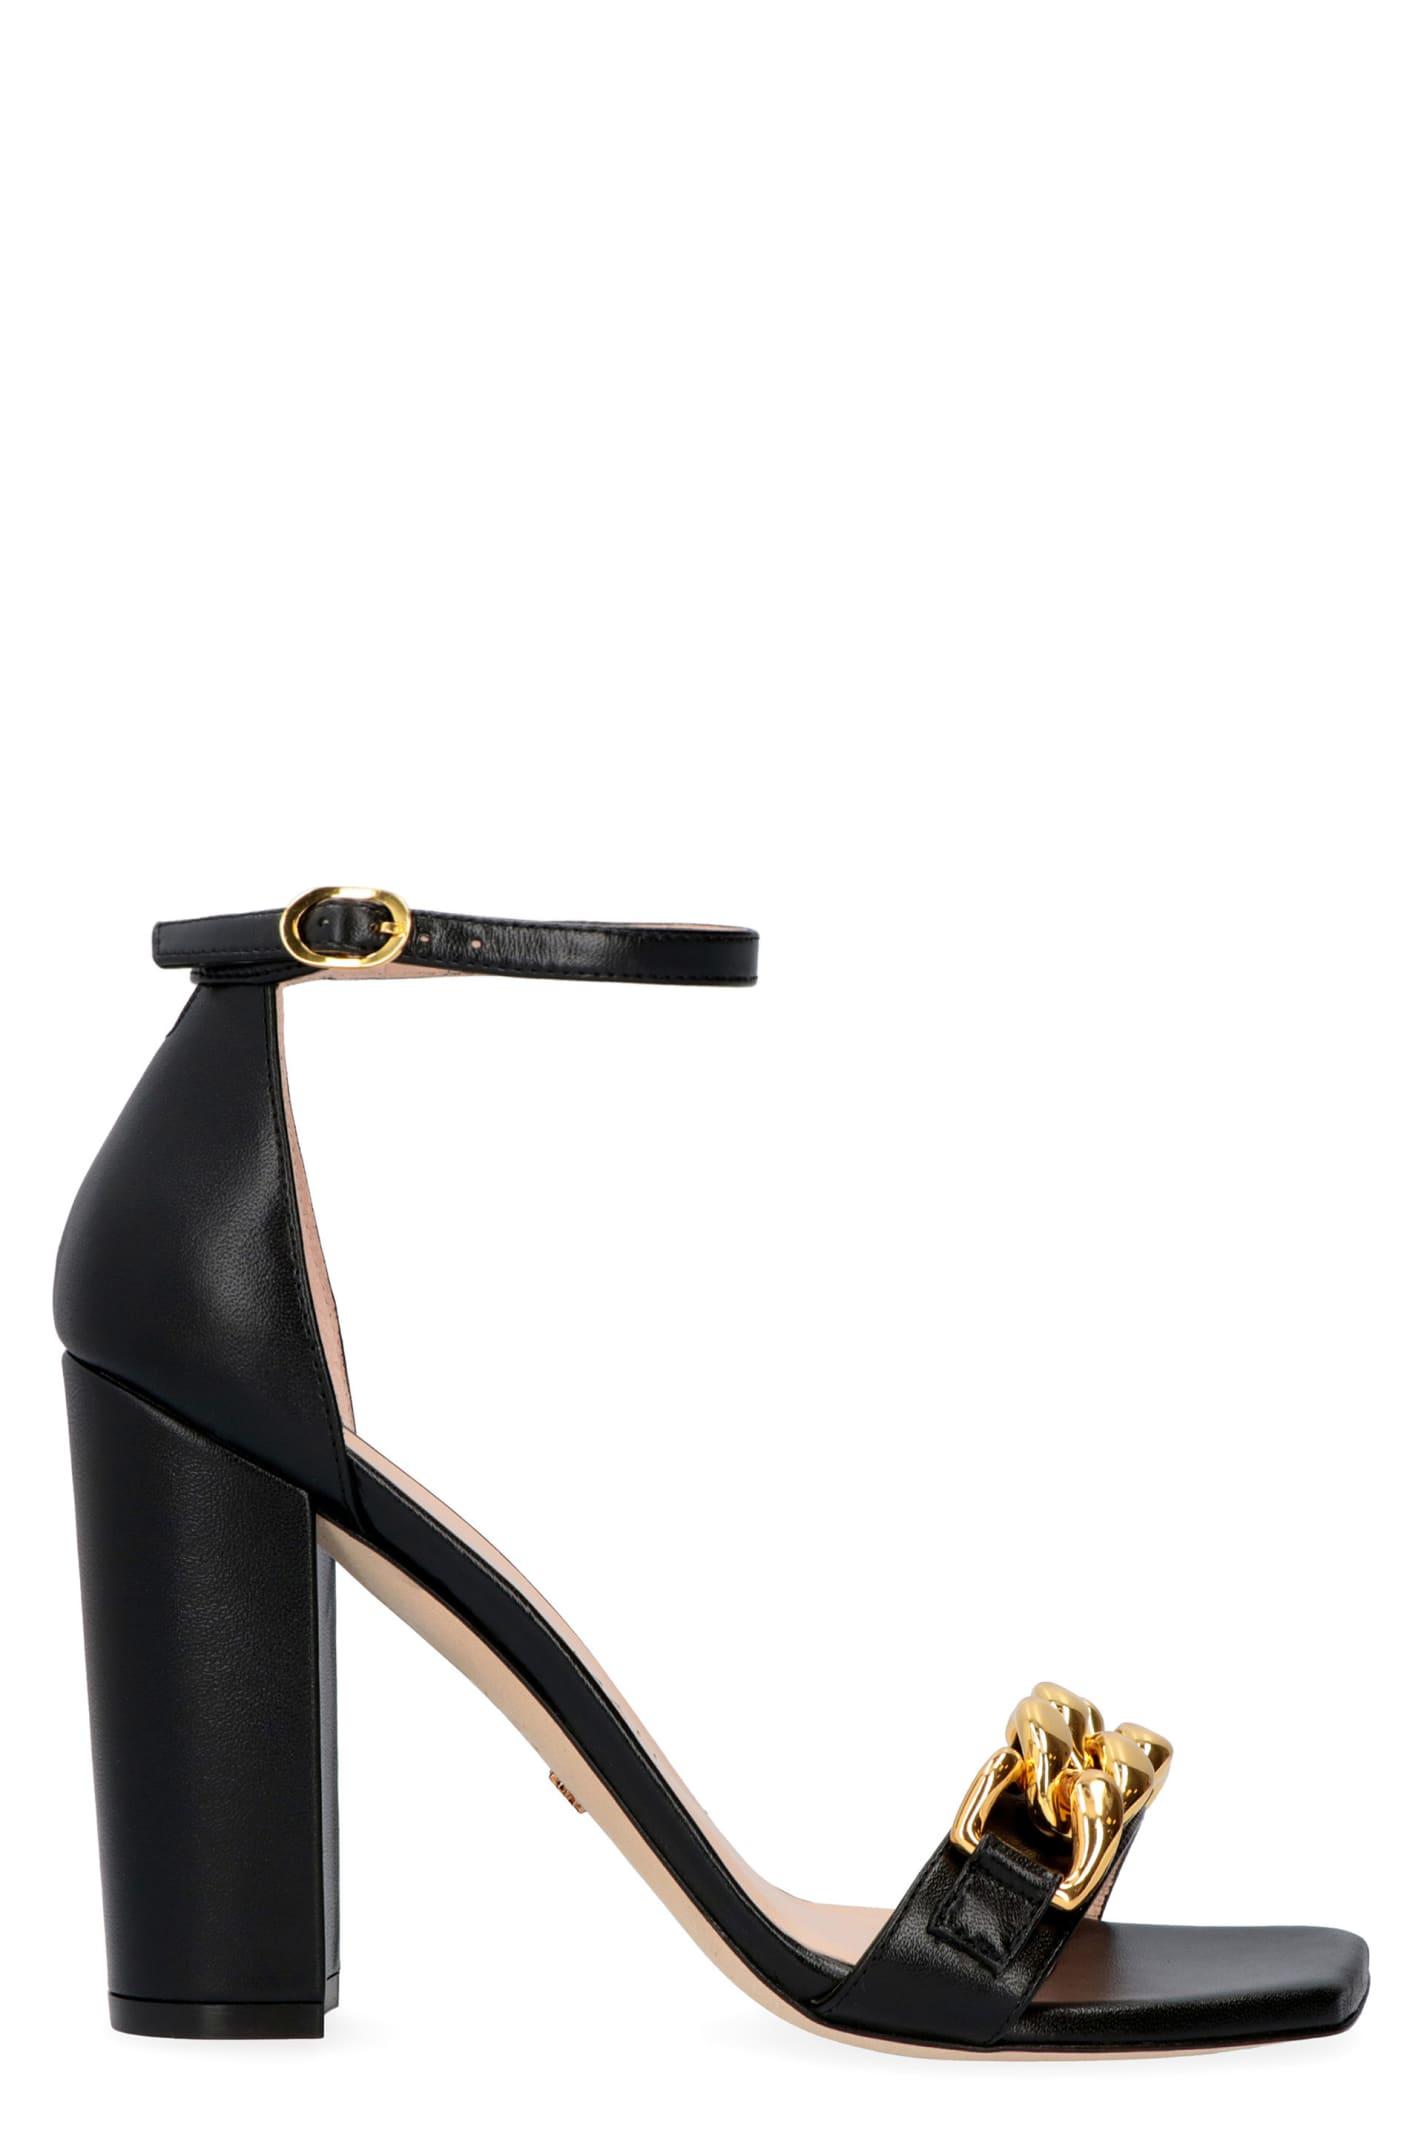 Buy Stuart Weitzman Amelina Heeled Sandals online, shop Stuart Weitzman shoes with free shipping